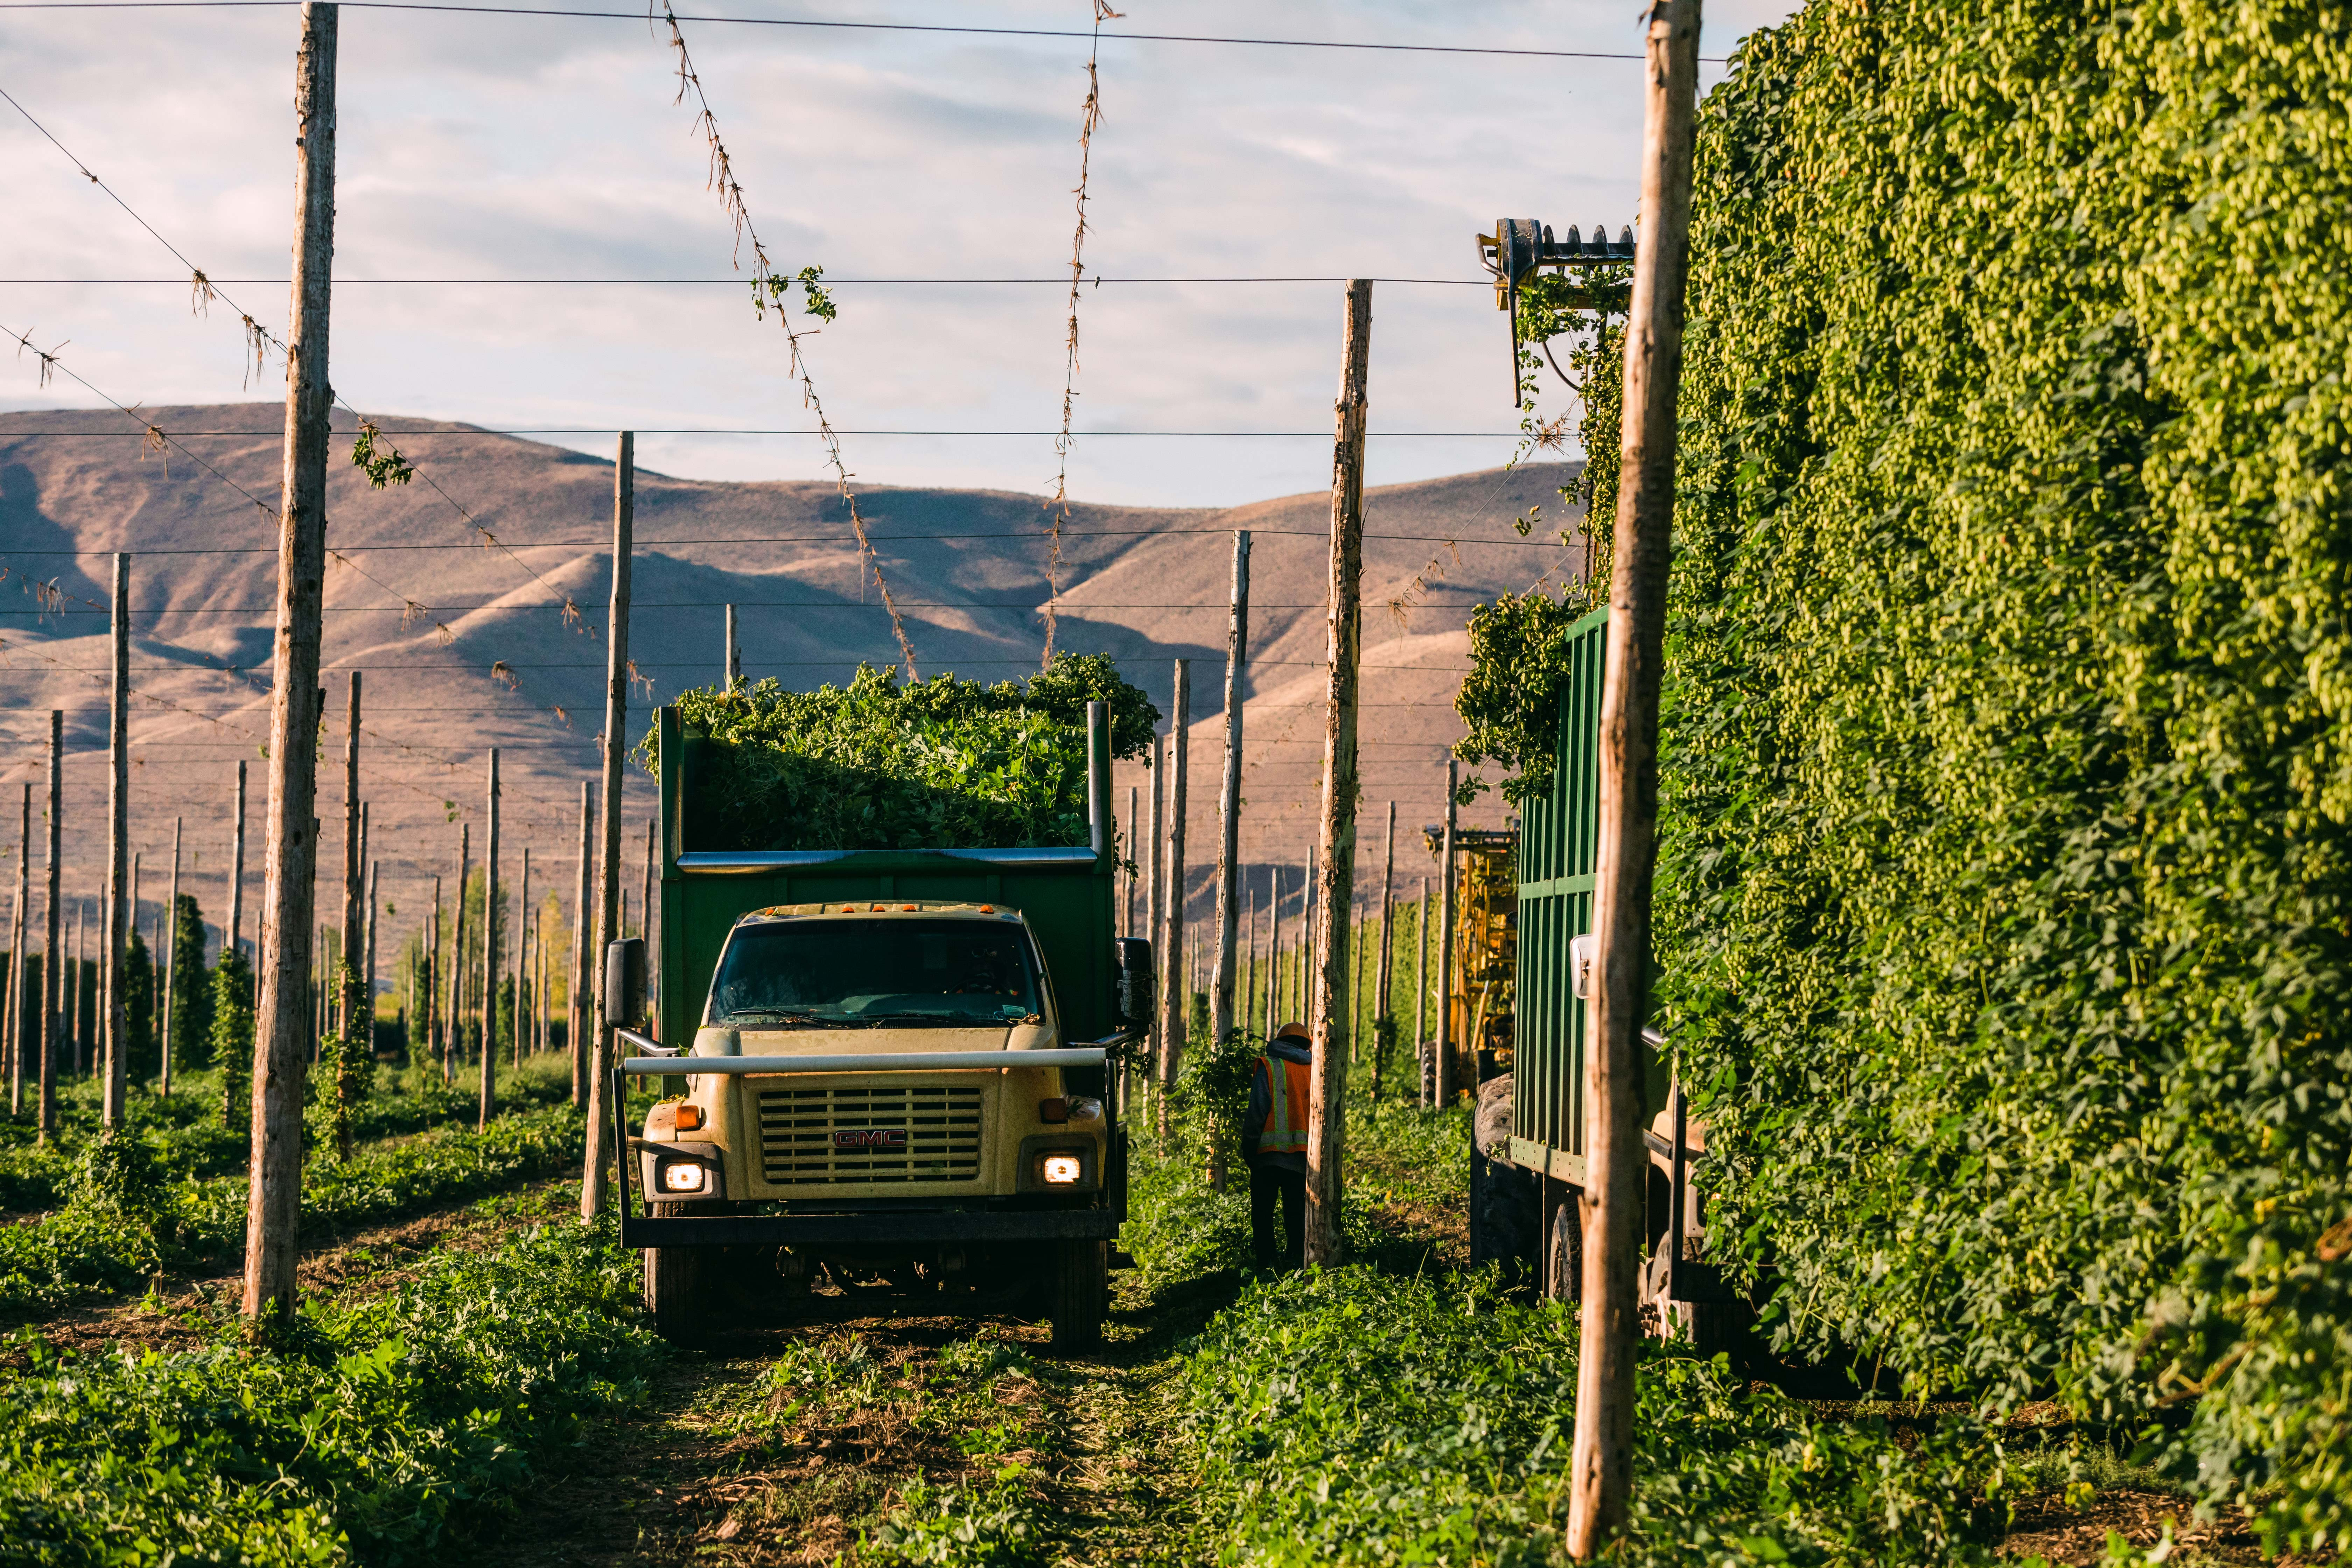 2021 Pacific Northwest Hop Harvest Update